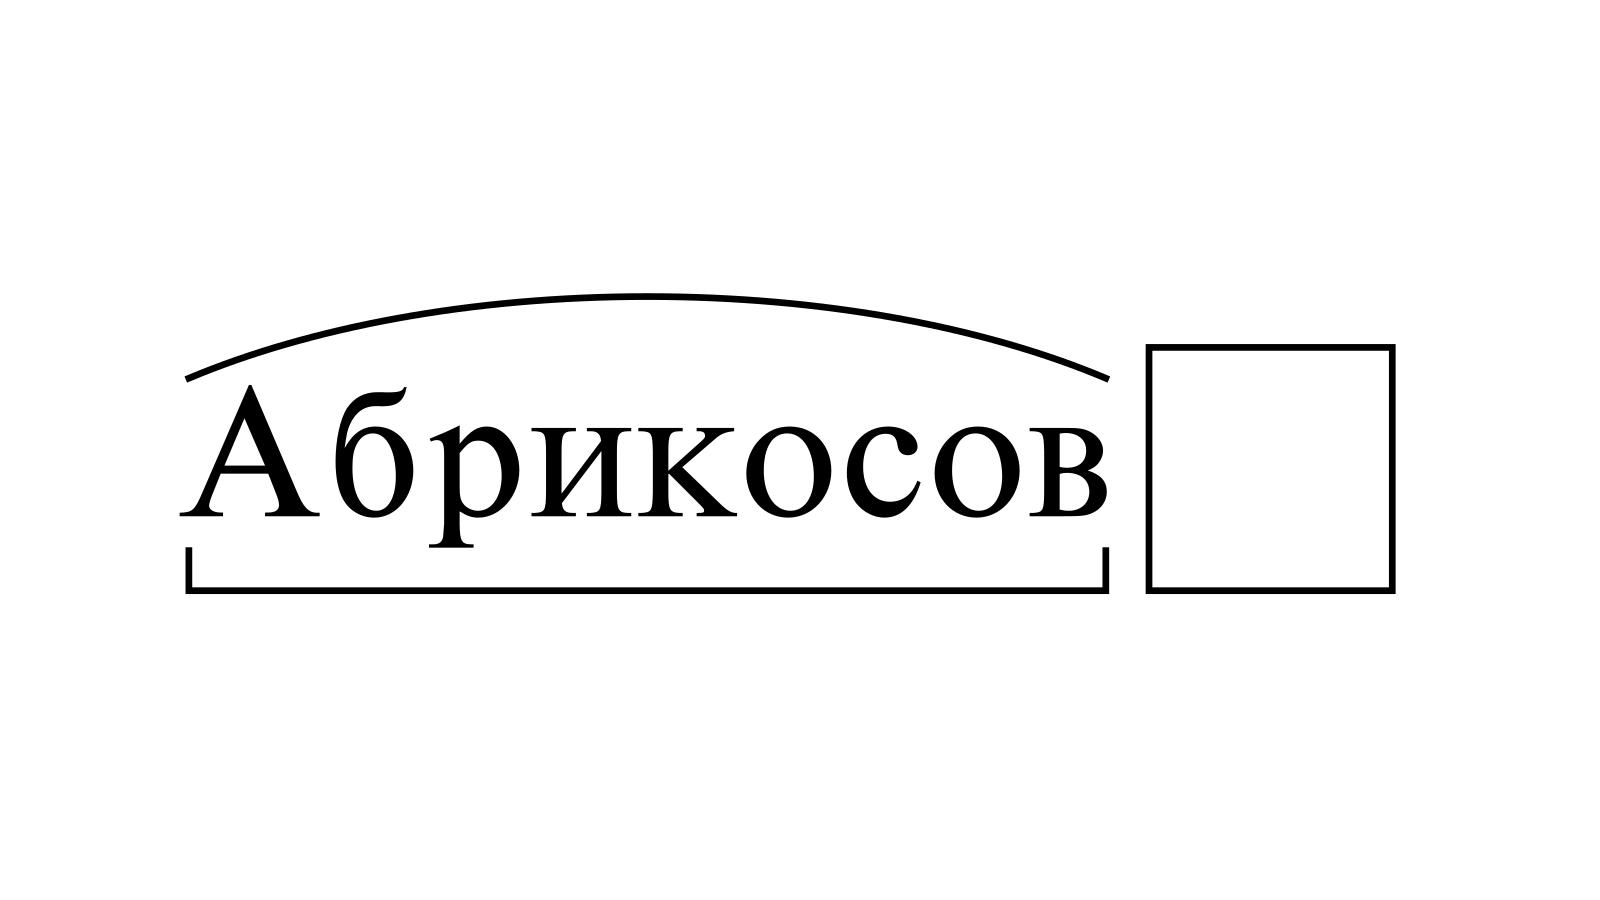 Разбор слова «Абрикосов» по составу